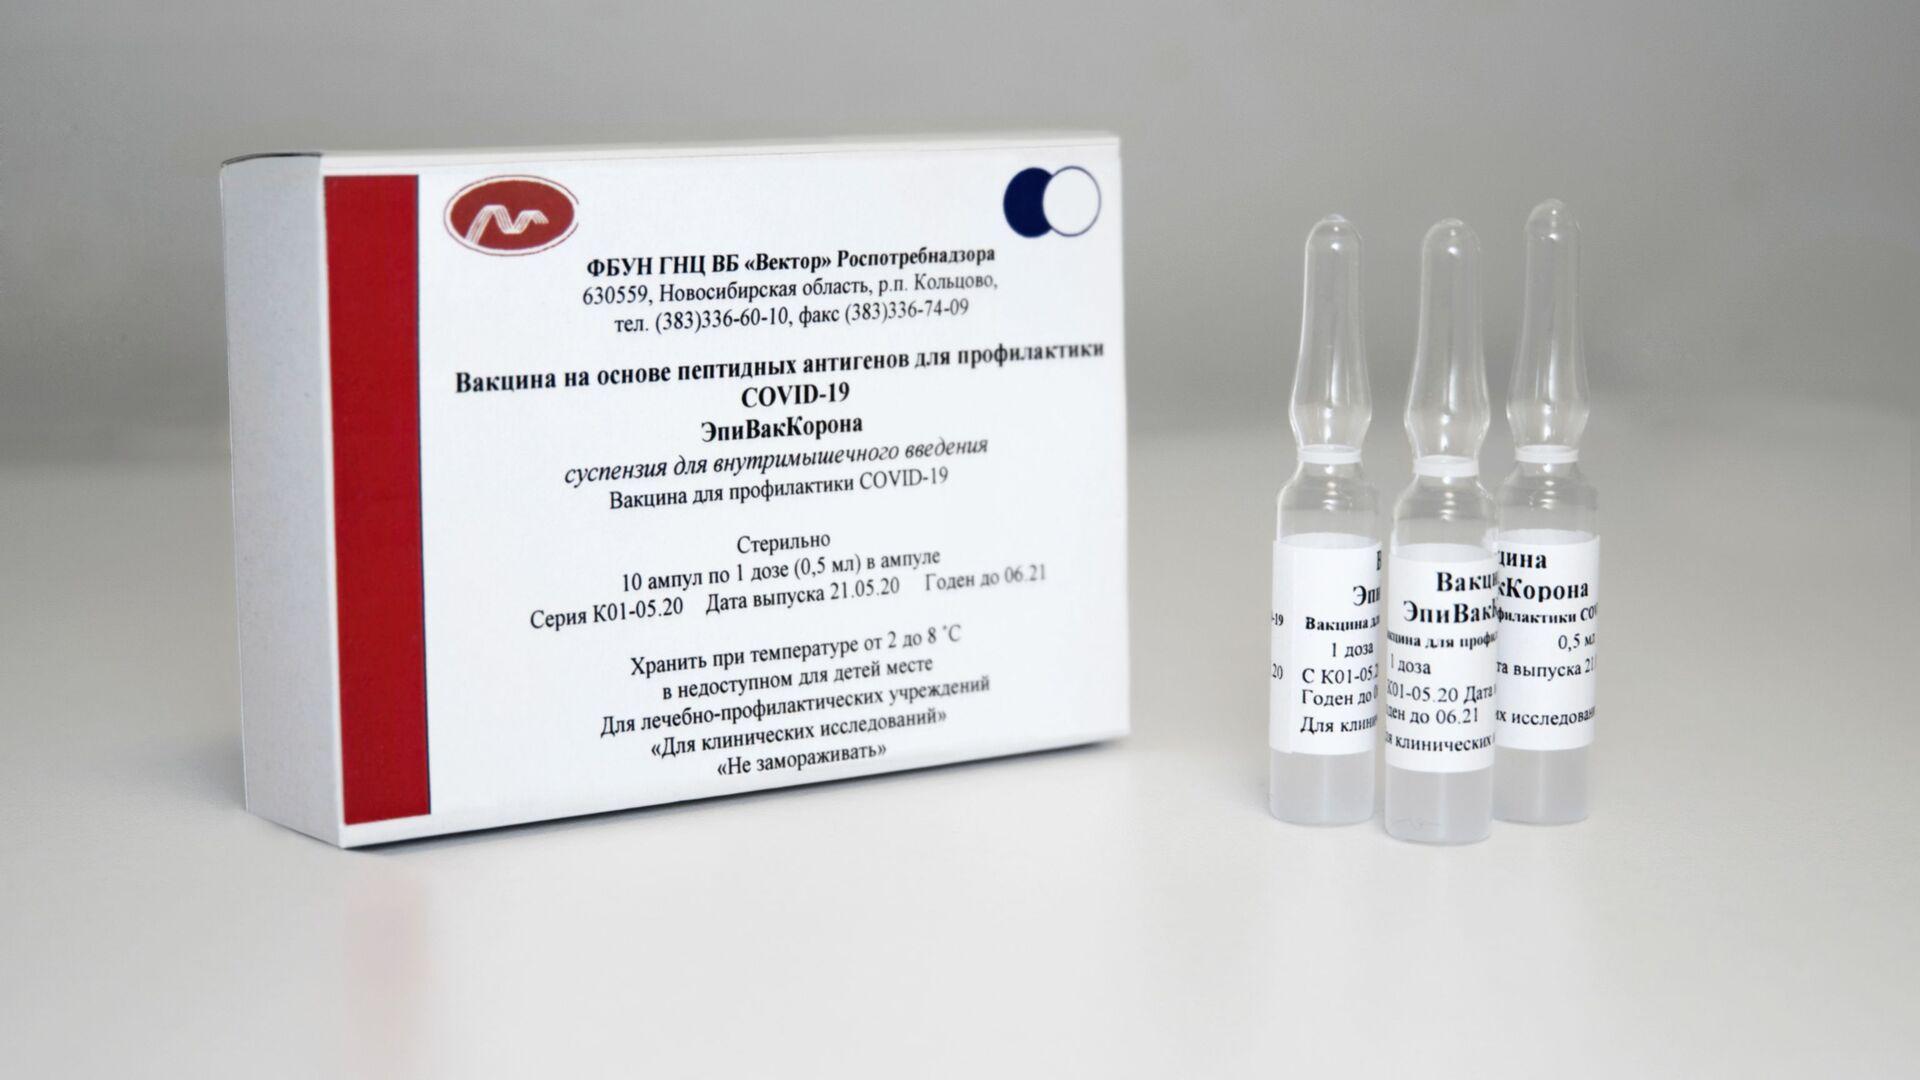 Vakcína EpiVakKorona vyvinutá v centru Vektor - Sputnik Česká republika, 1920, 26.03.2021